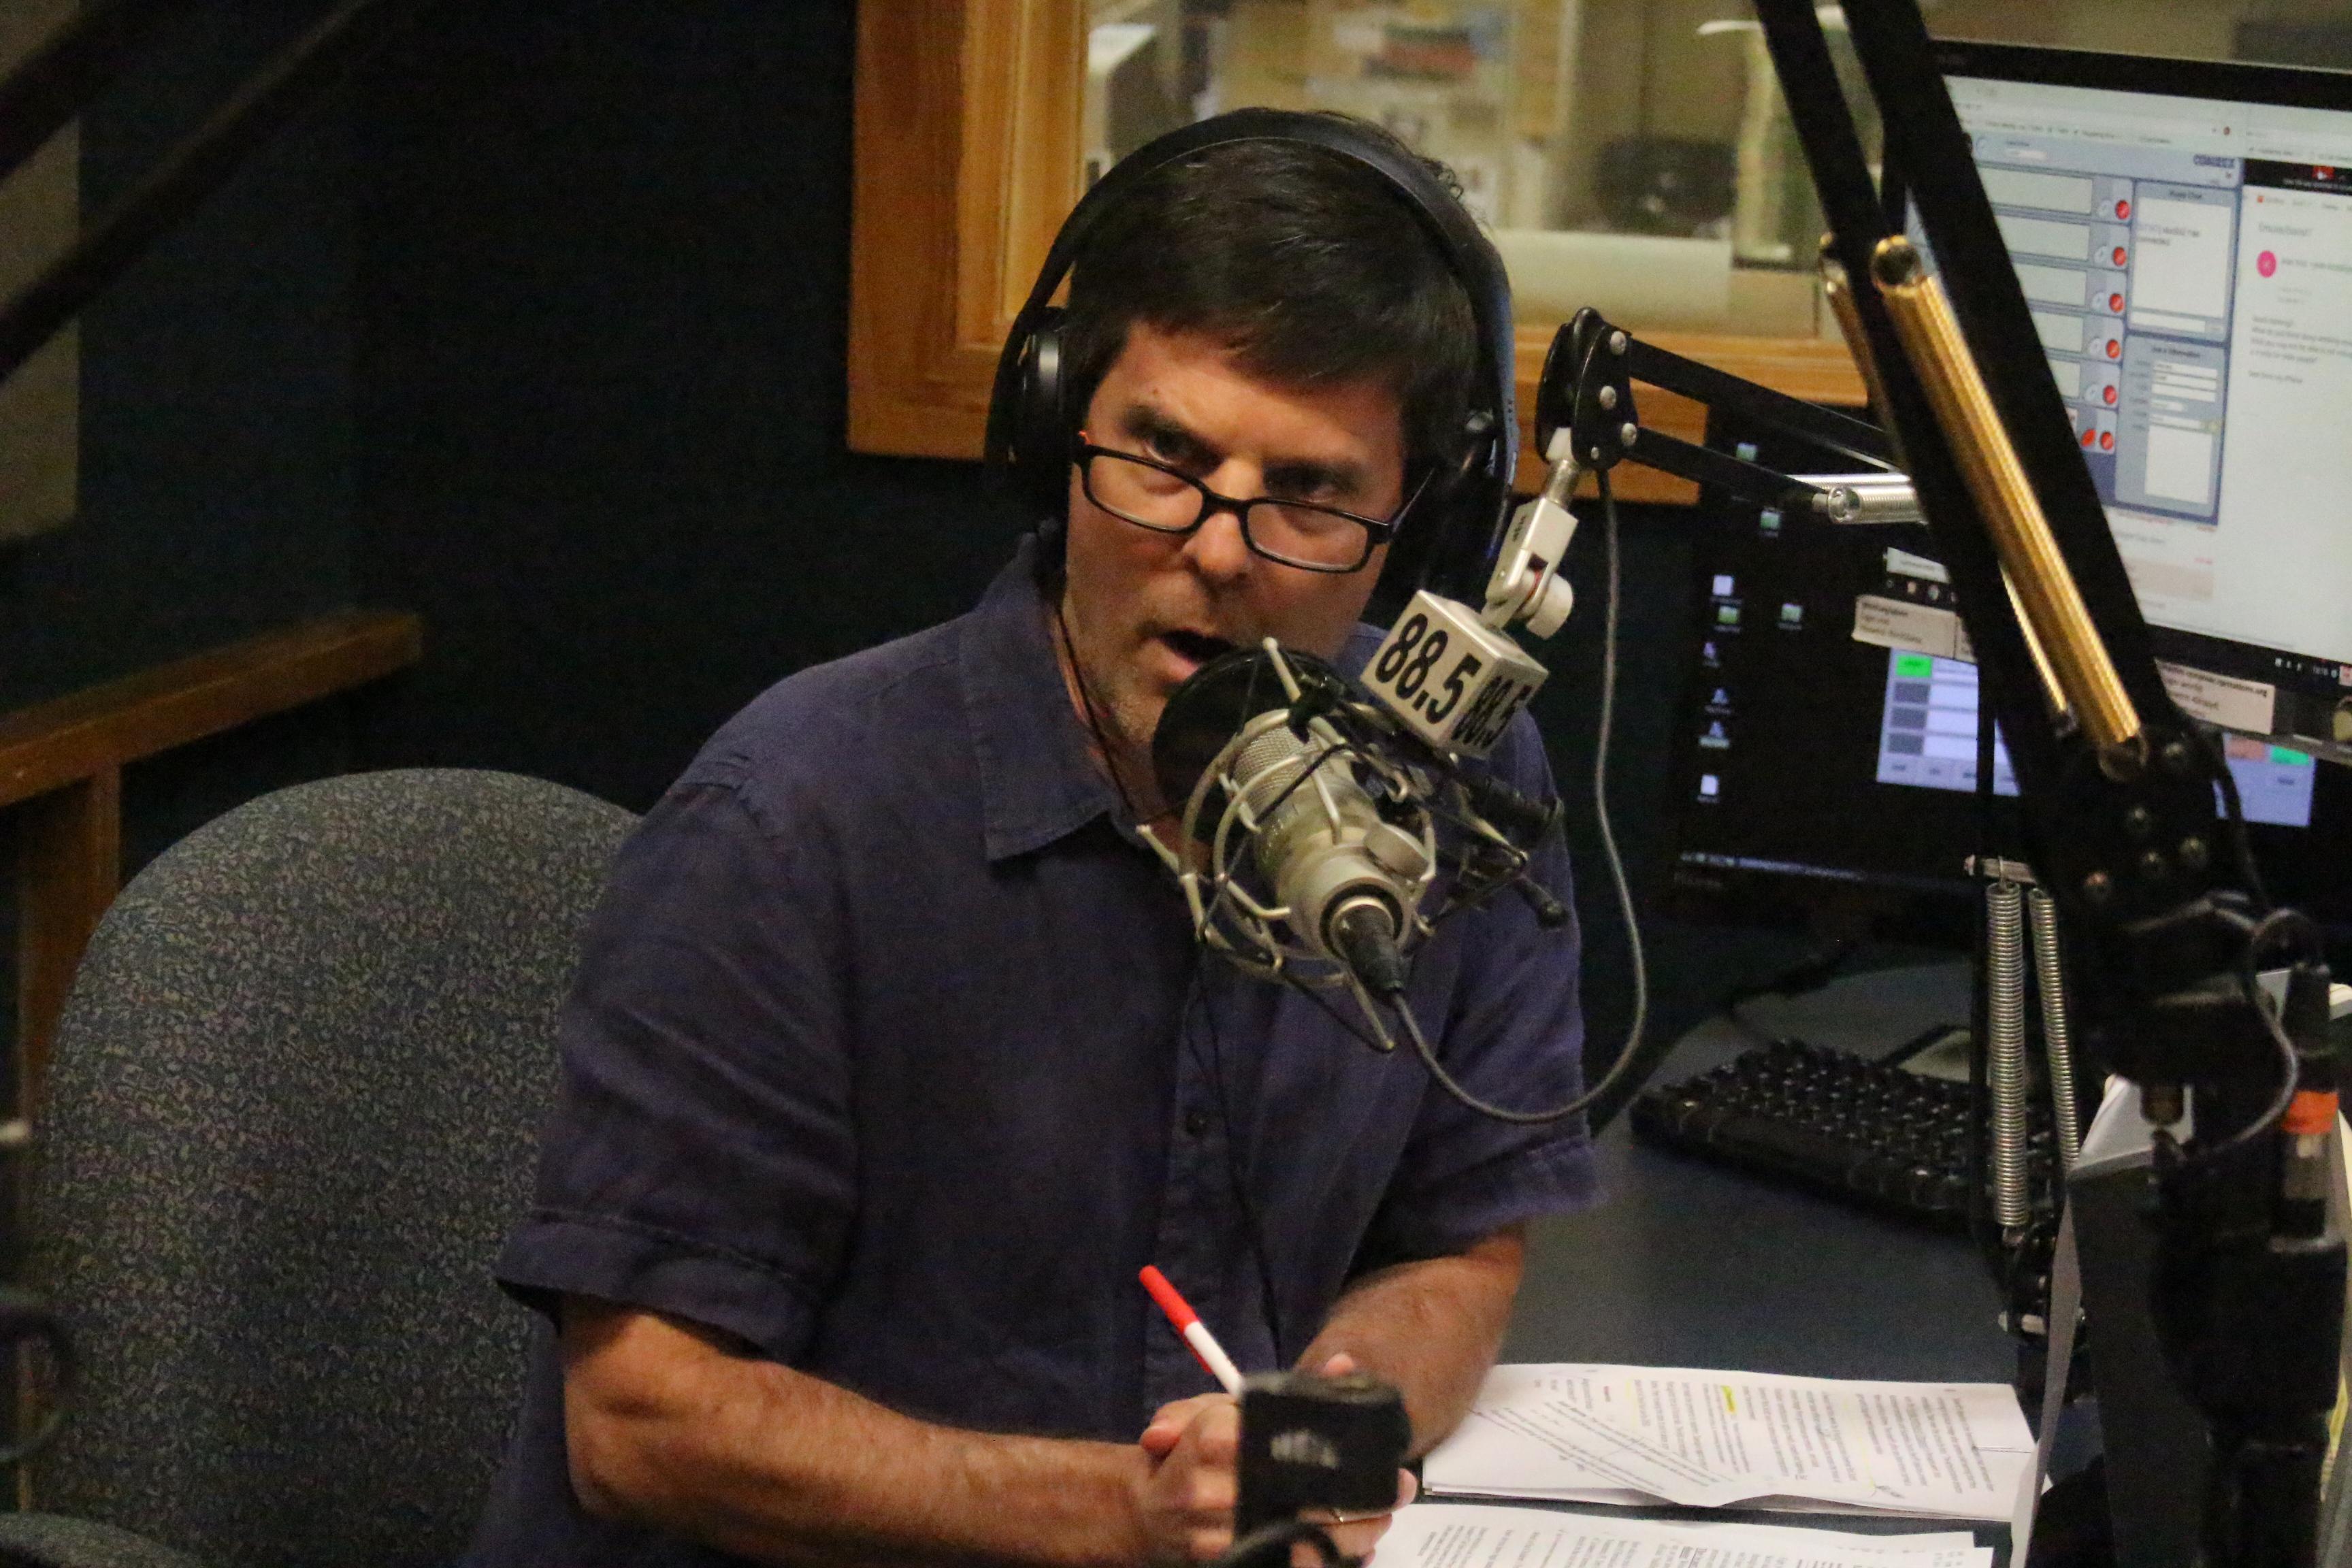 WMNF News MidPoint host Seán Kinane